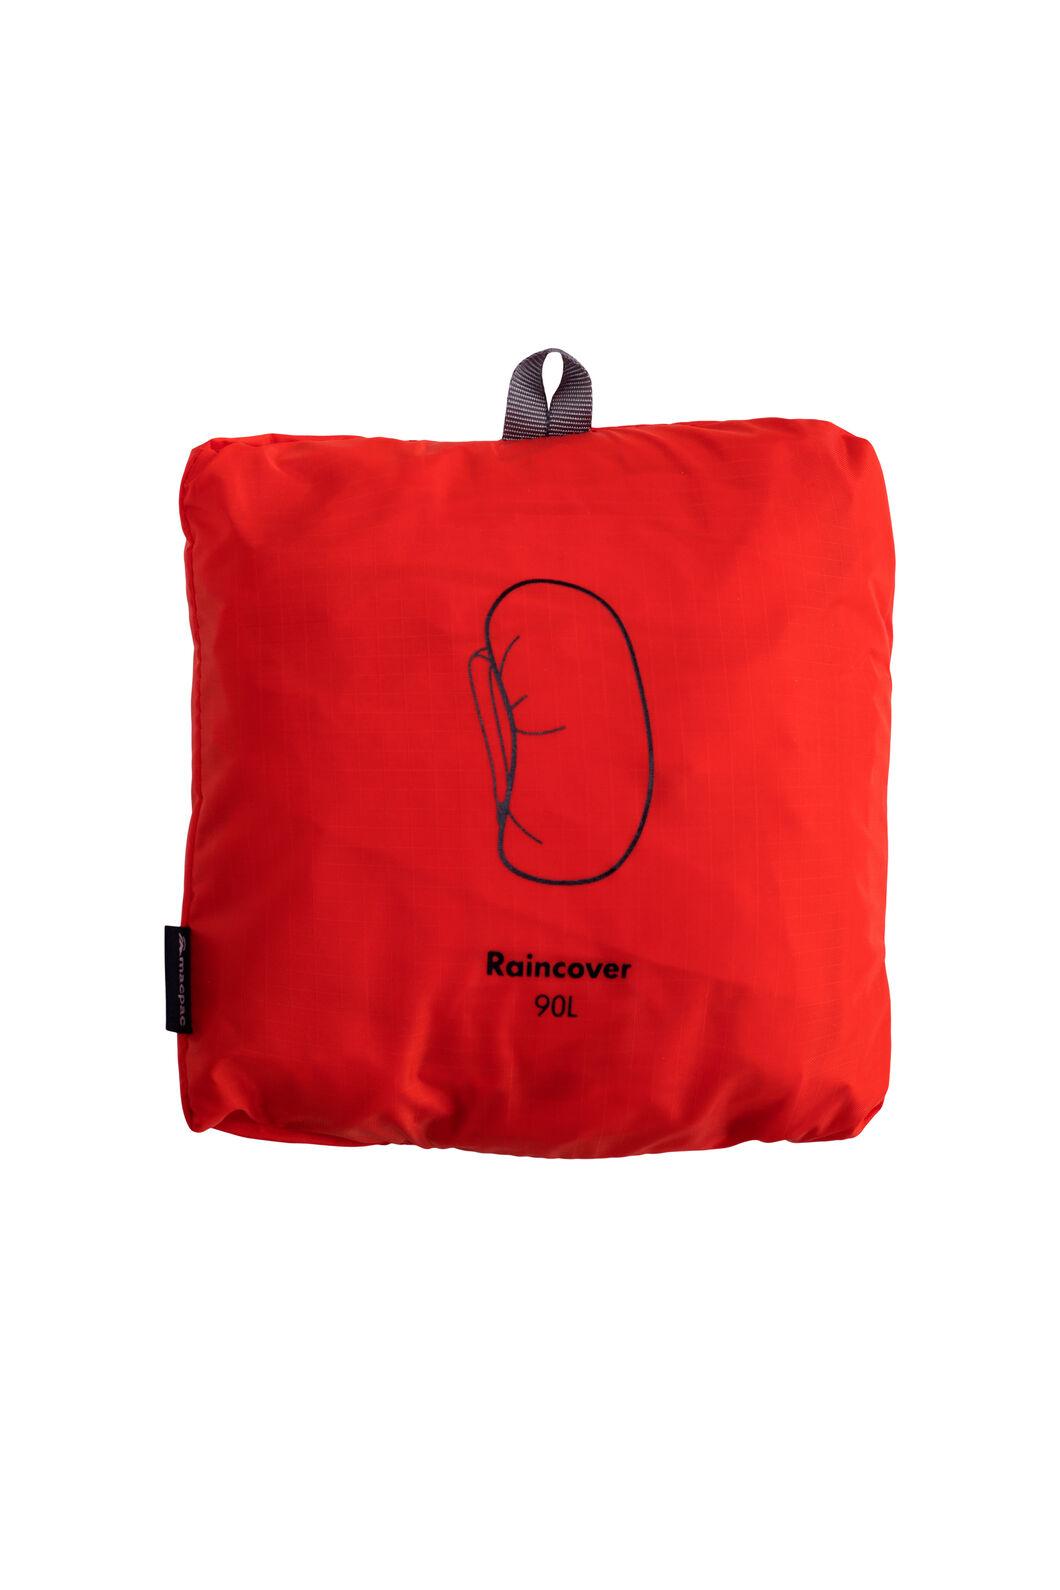 Macpac Pack Raincover — Extra Large, Indicator, hi-res